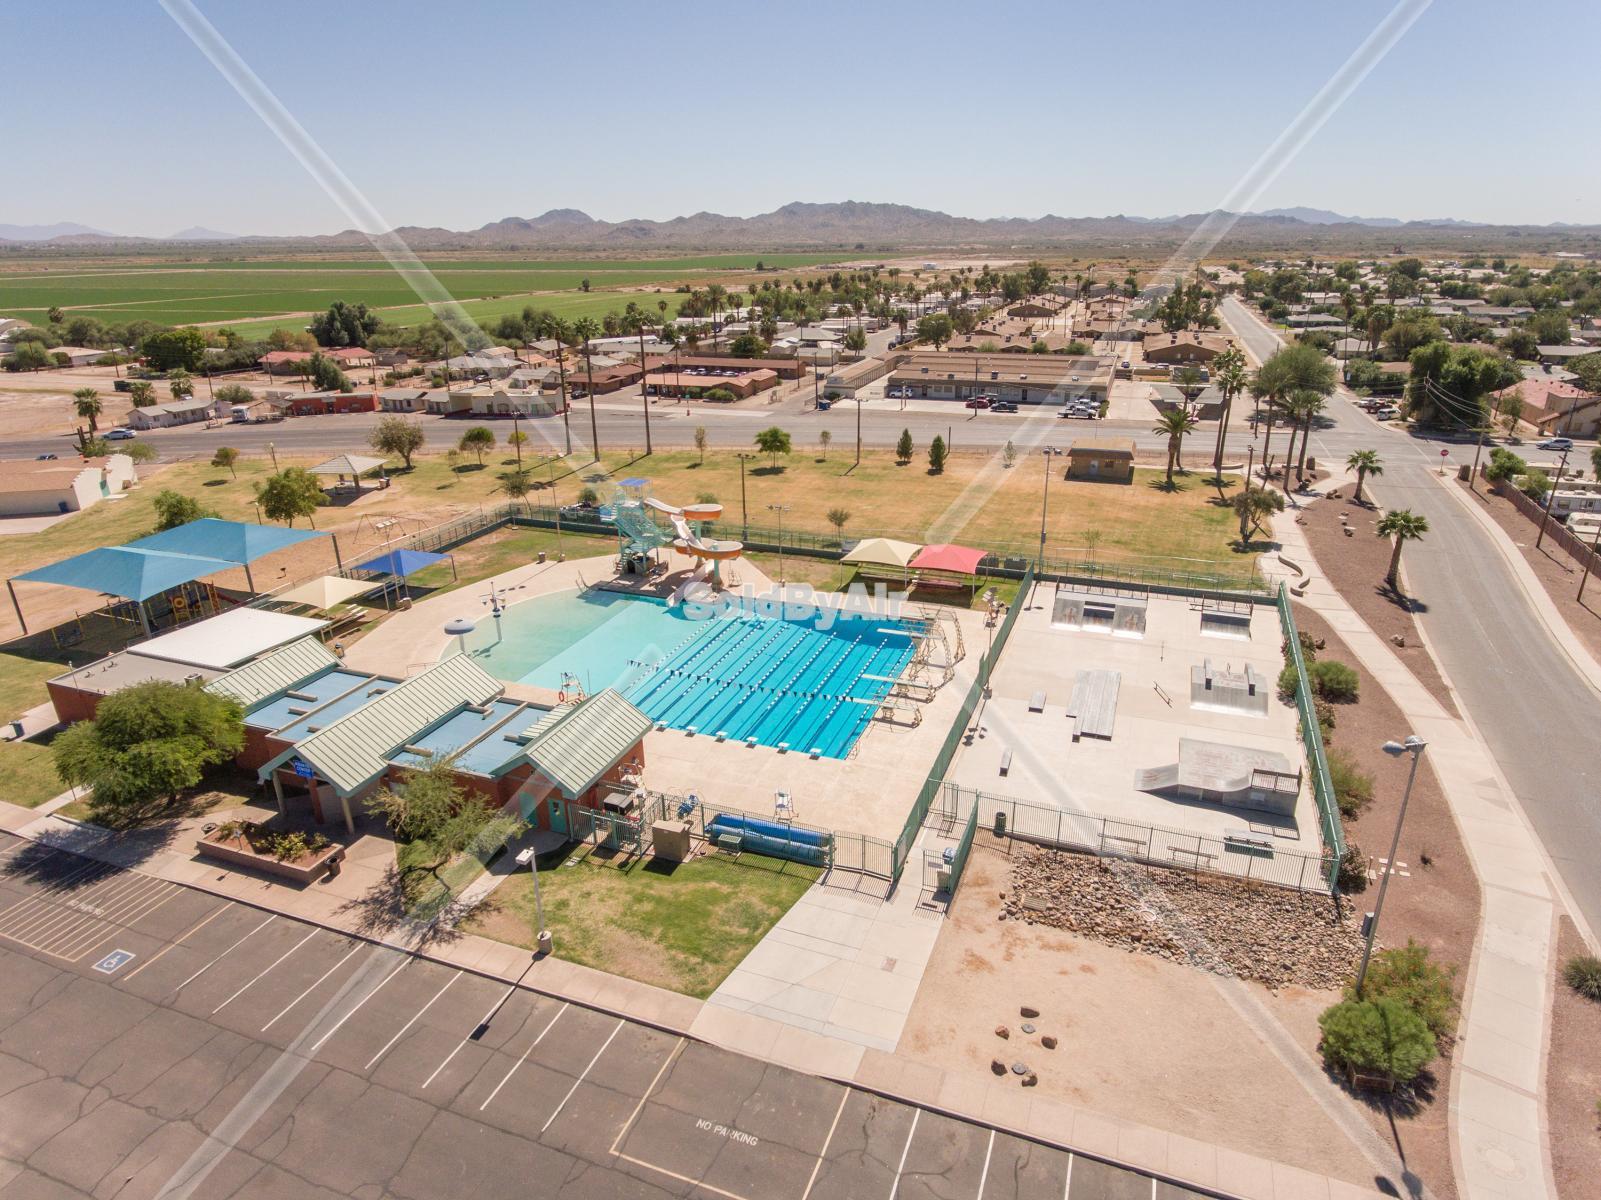 Drone Photo of Washington Park in Phoenix Arizona